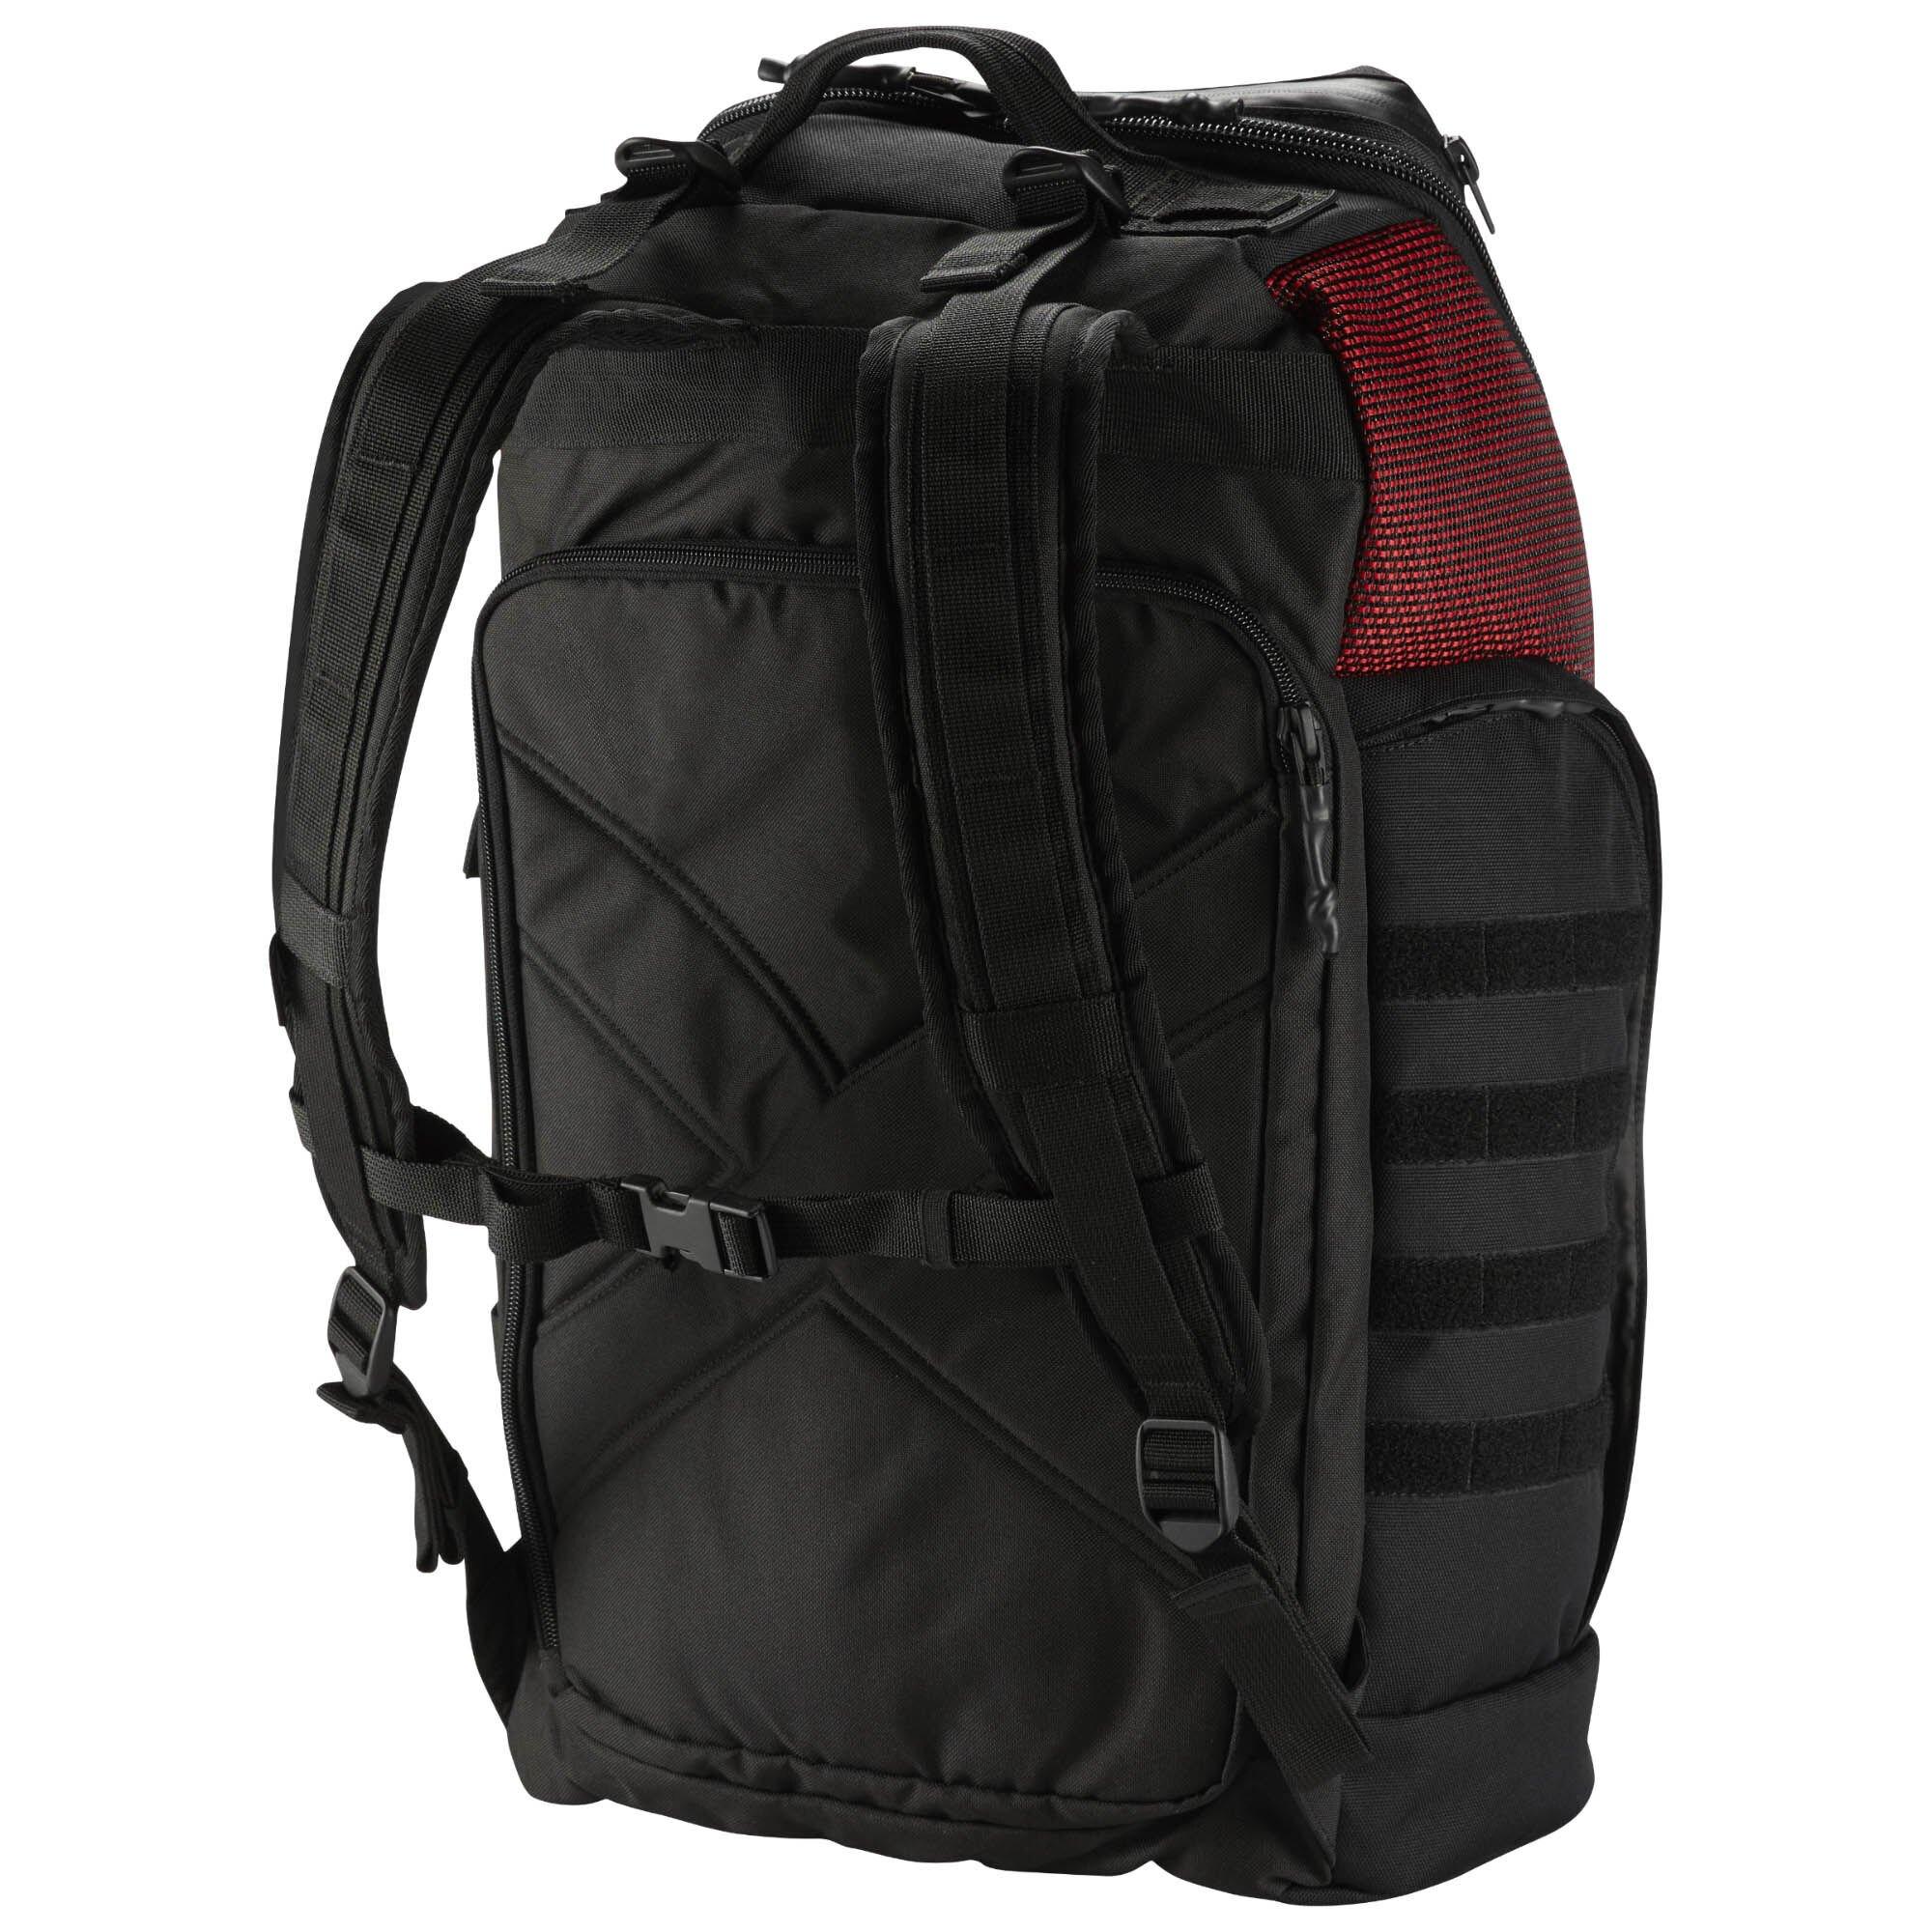 REEBOK CROSSFIT BACKPACK 後背包 雙肩 休閒 運動 筆電 黑 紅【運動世界】CD7259